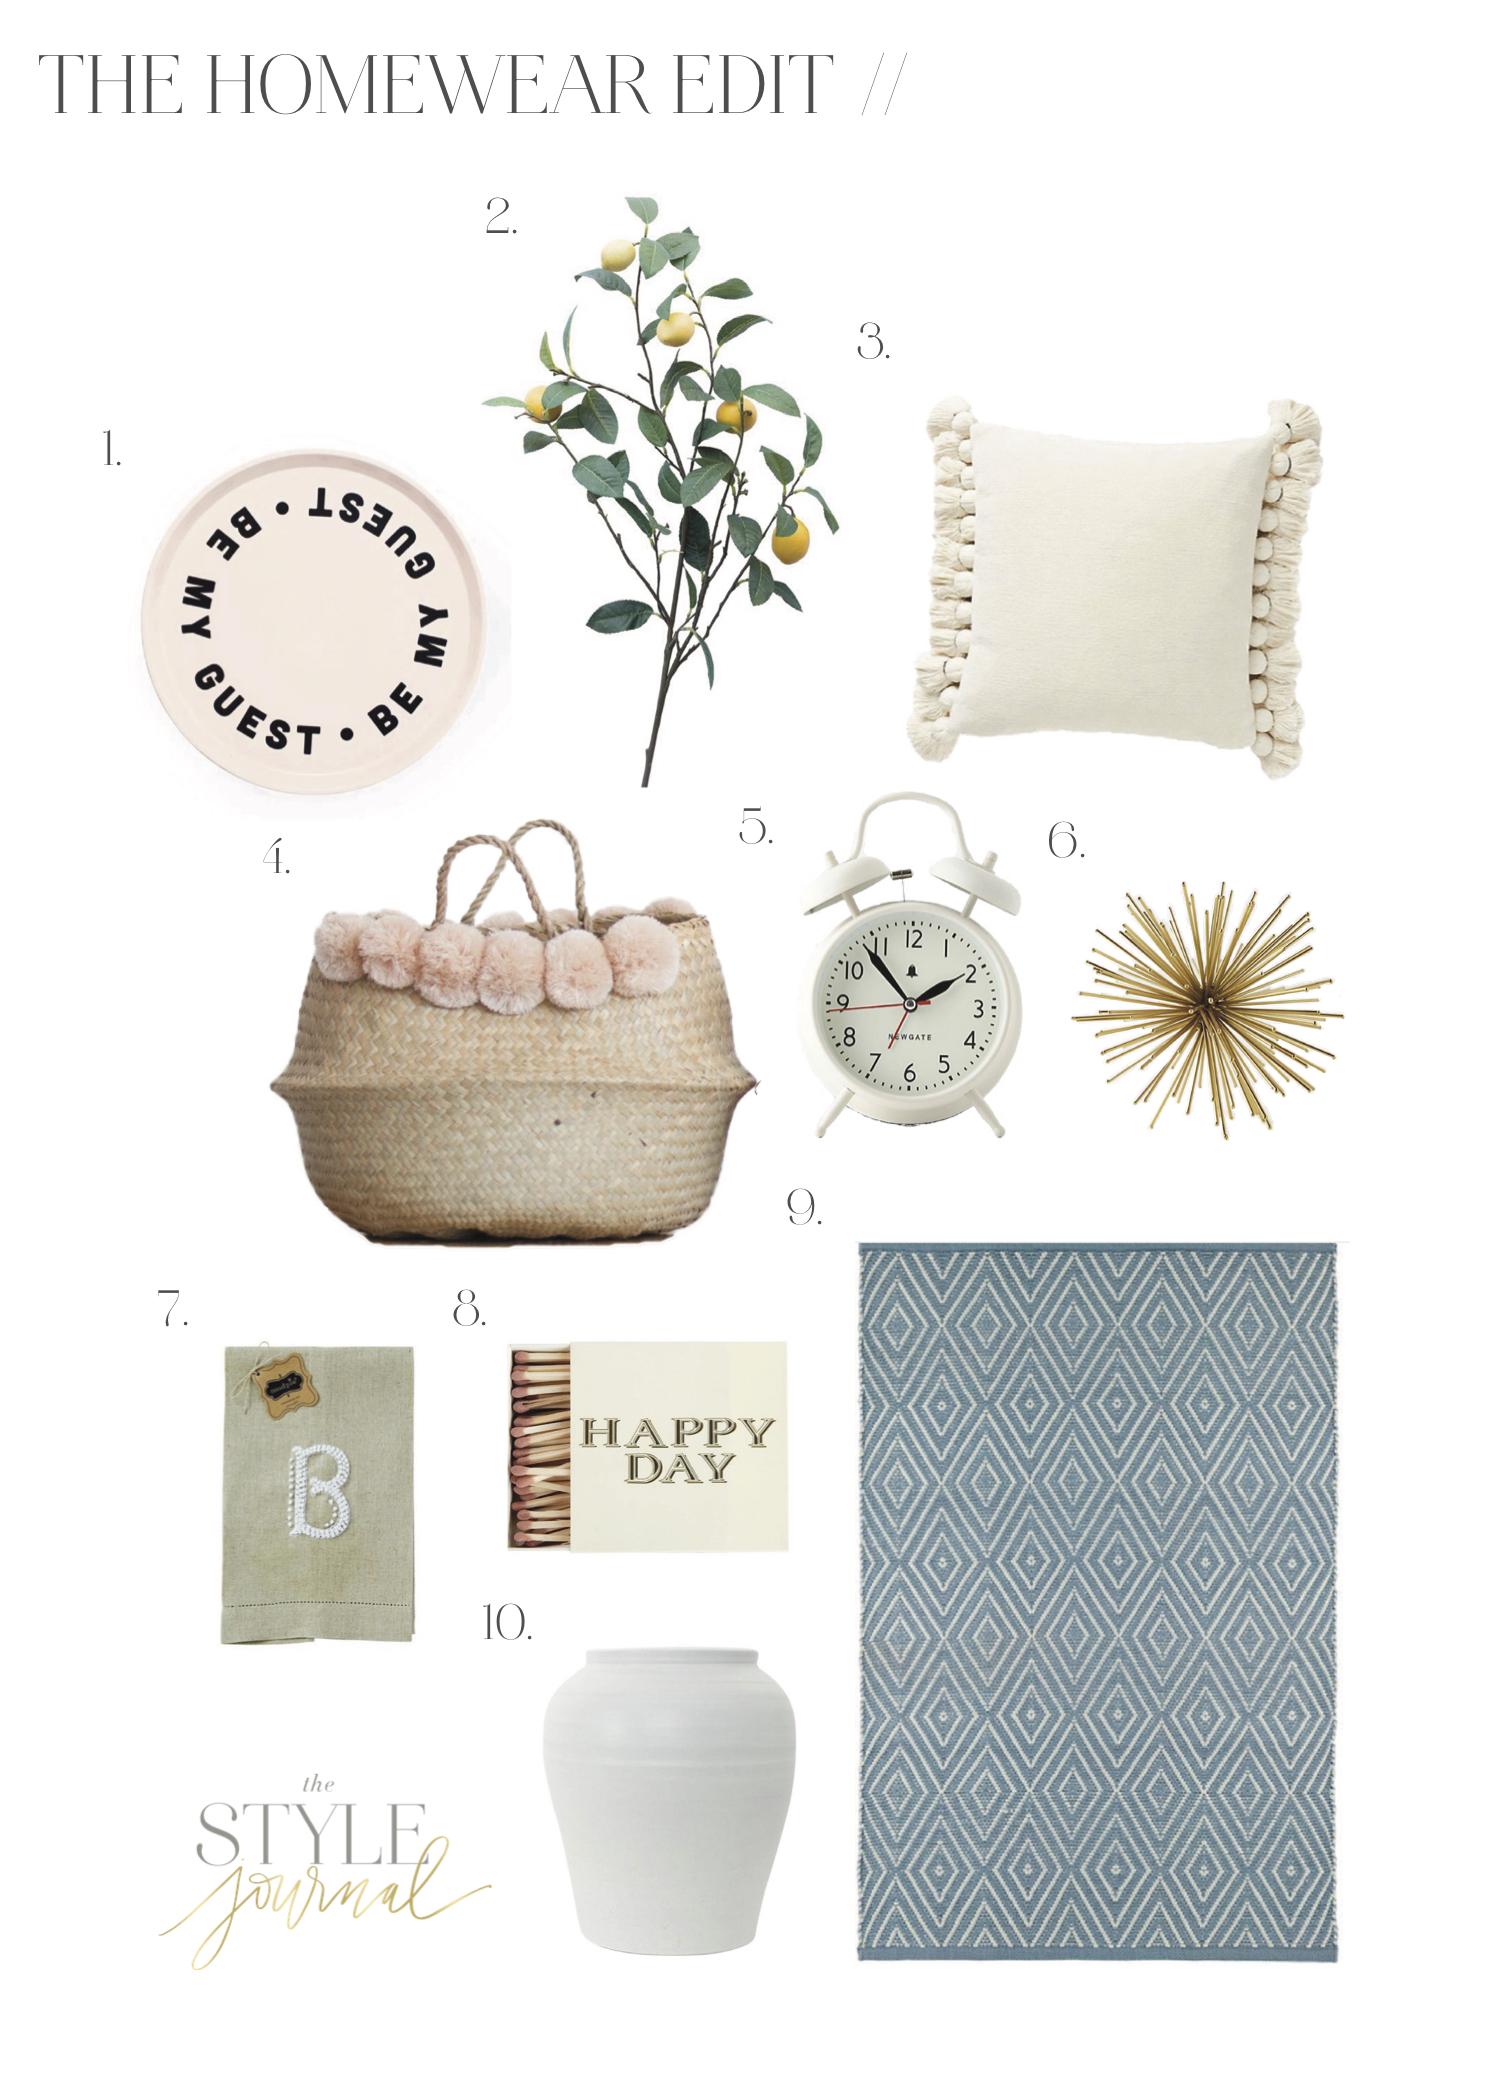 homewear edit.jpg